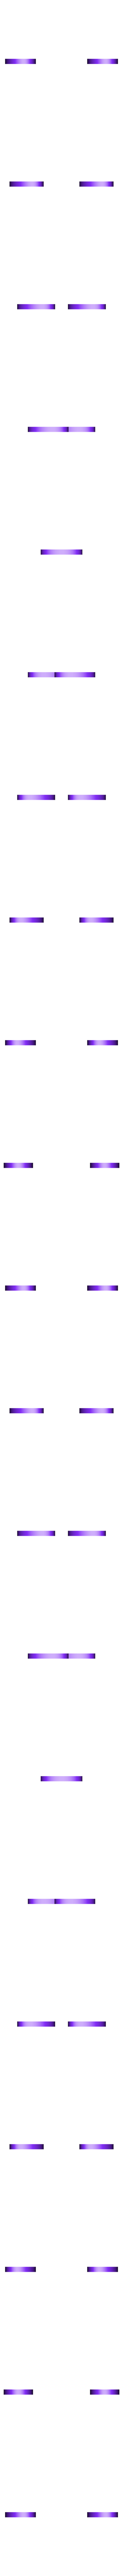 bag_holder_poop_emoji_puplis.STL Download free STL file Multi-Color Dog Poop Bag Dispenser • 3D print template, MosaicManufacturing